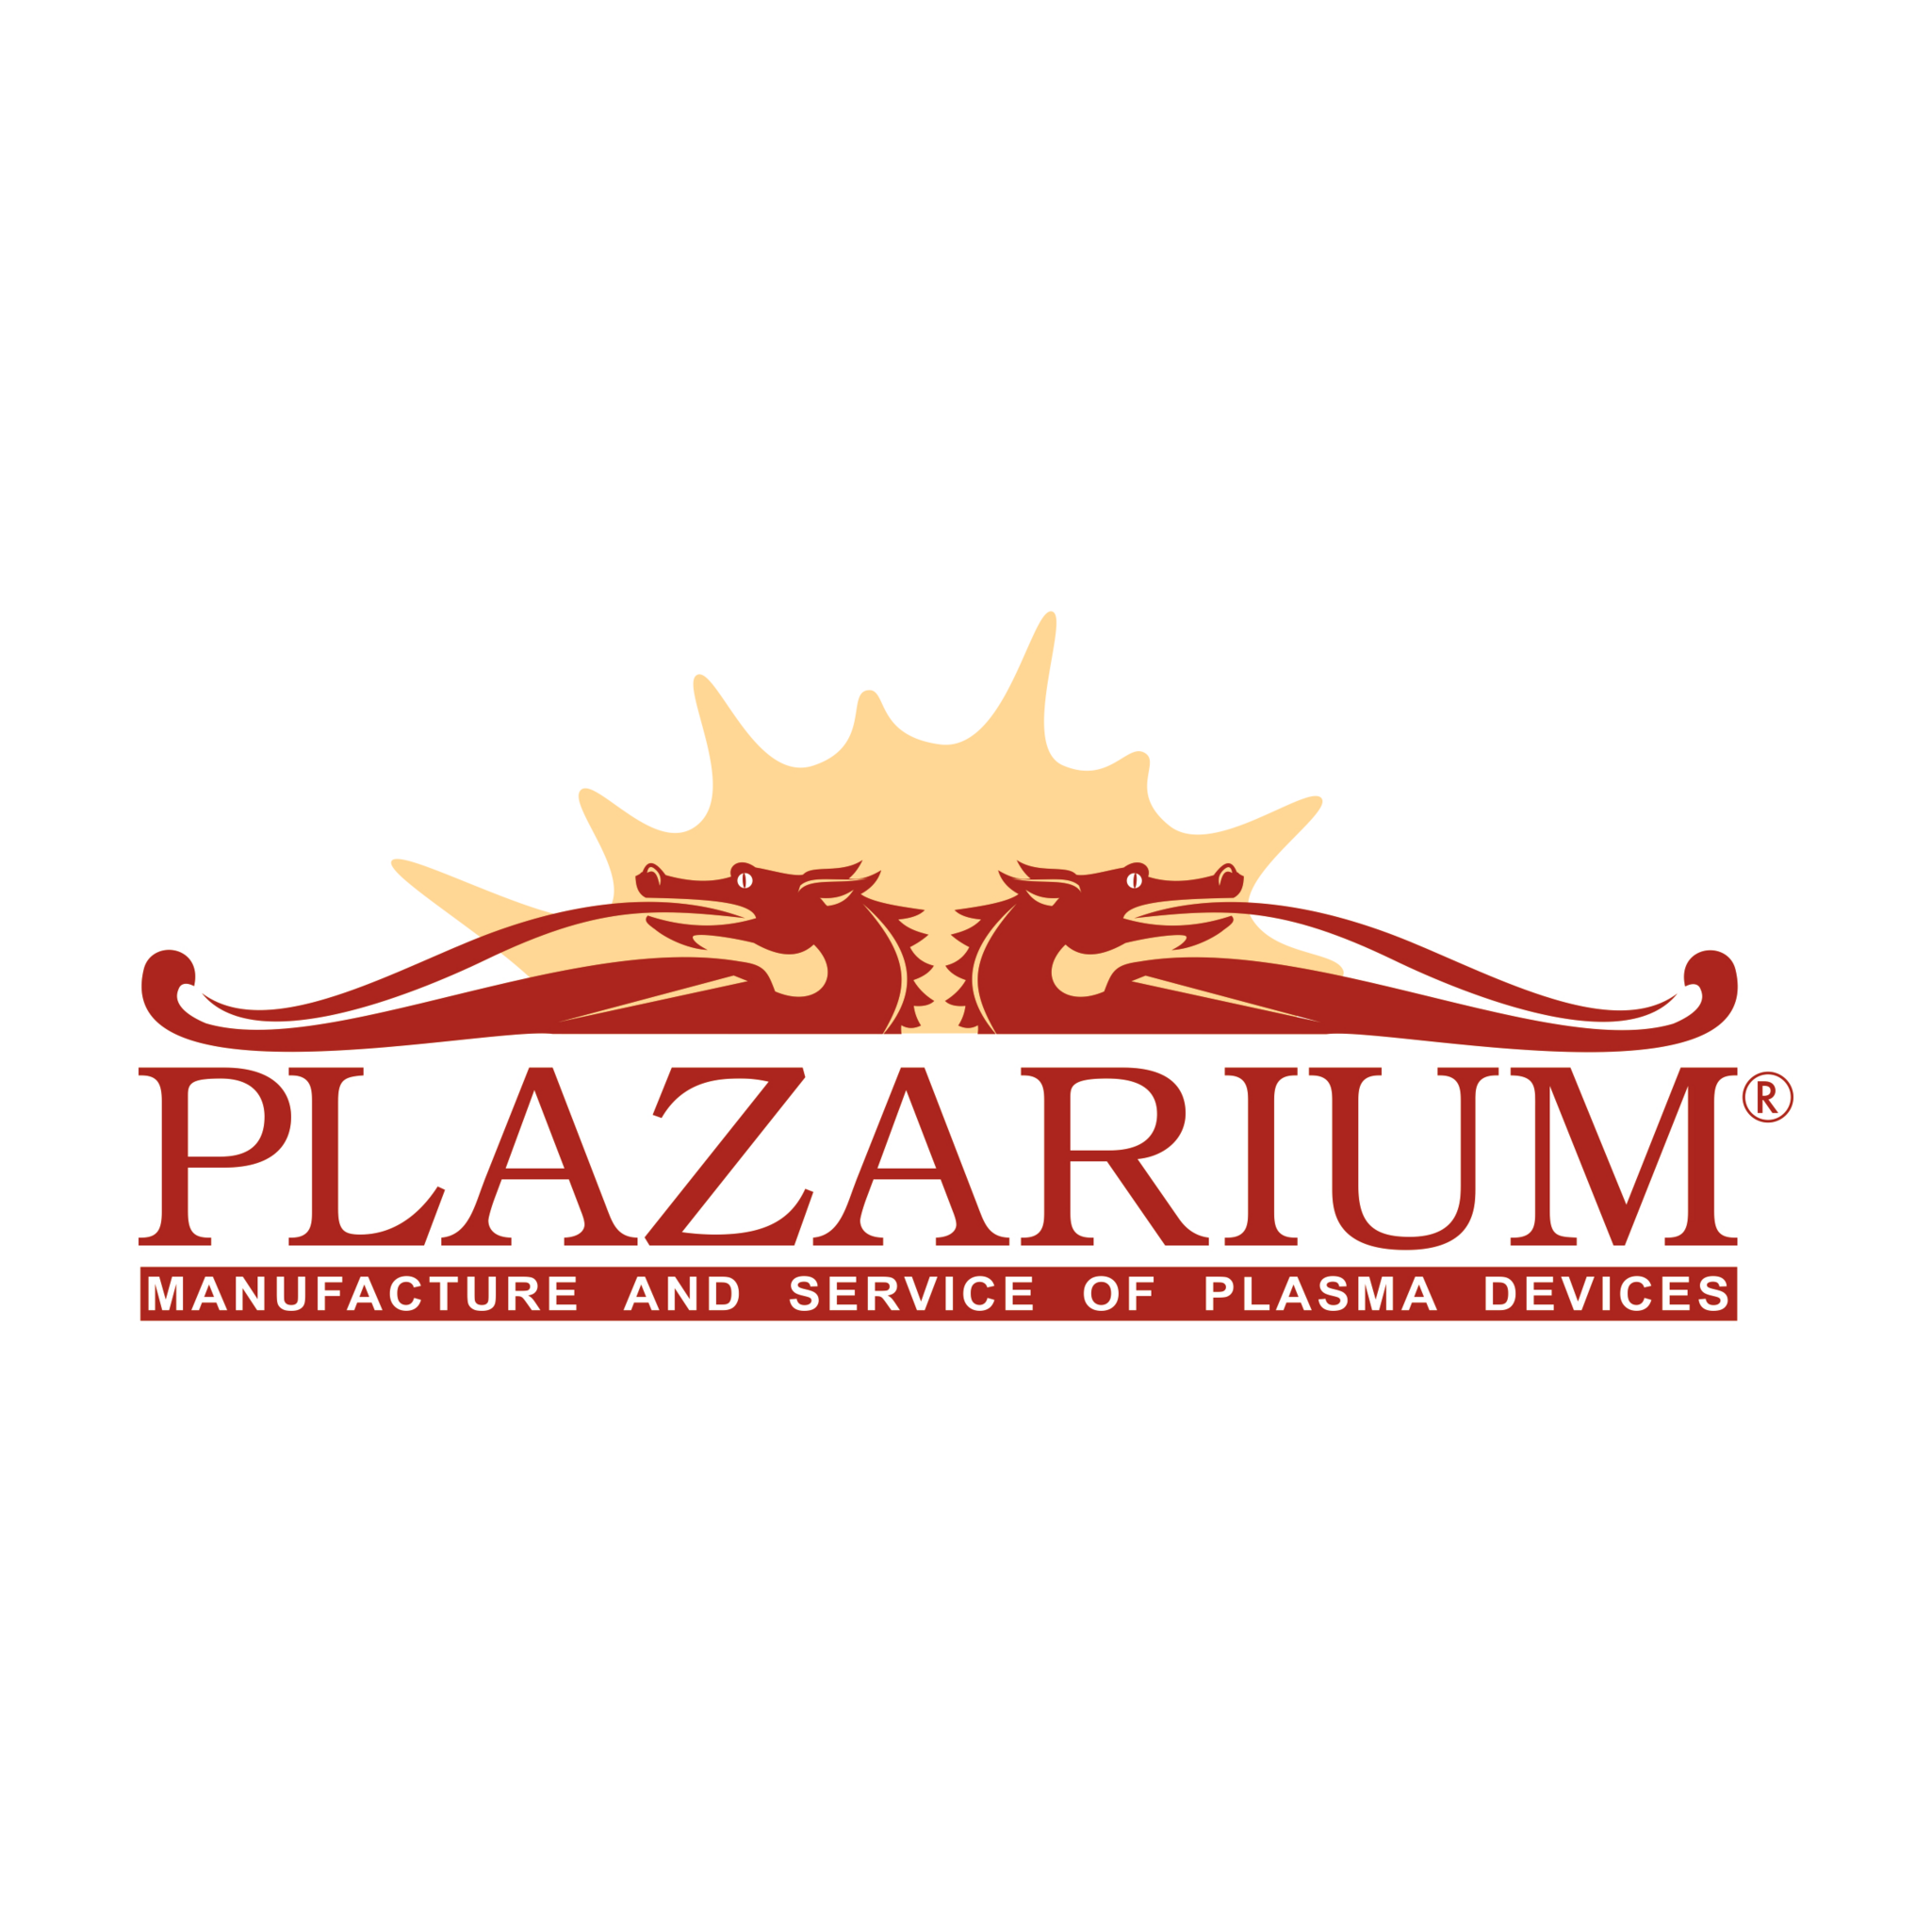 Company logo of PLAZARIUM GmbH